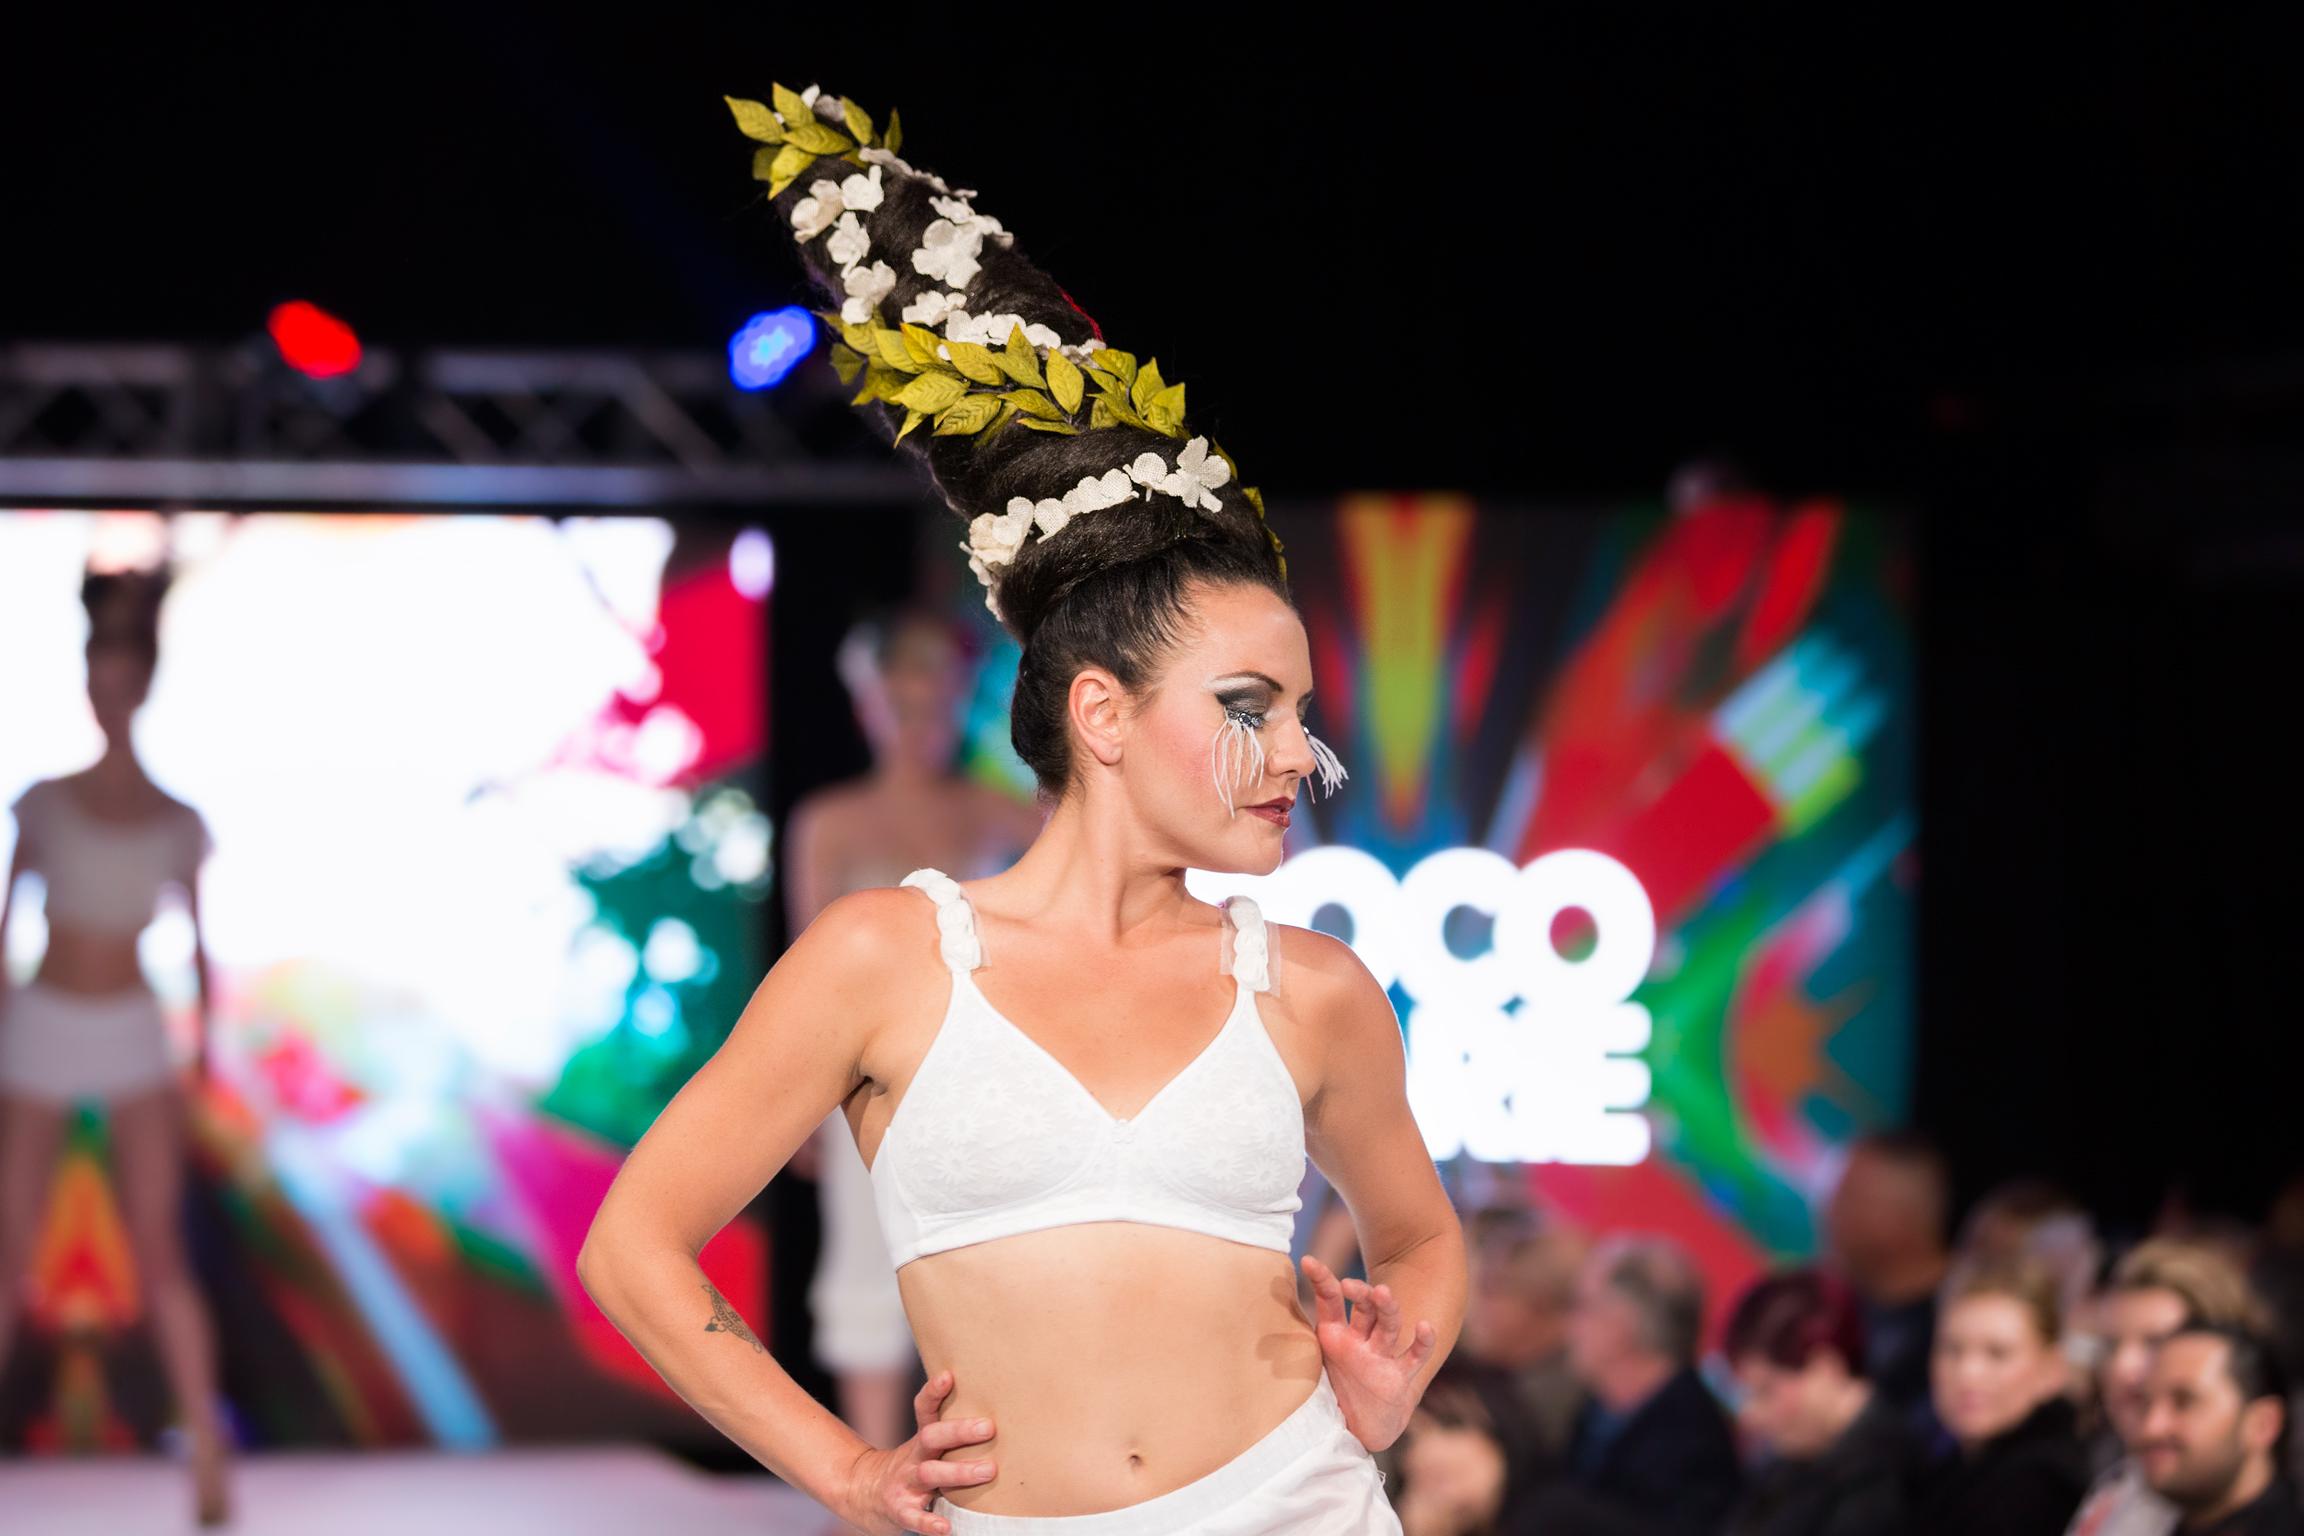 Denver-Fashion-Week-Day-4-_-Coco-Marie---006.jpg